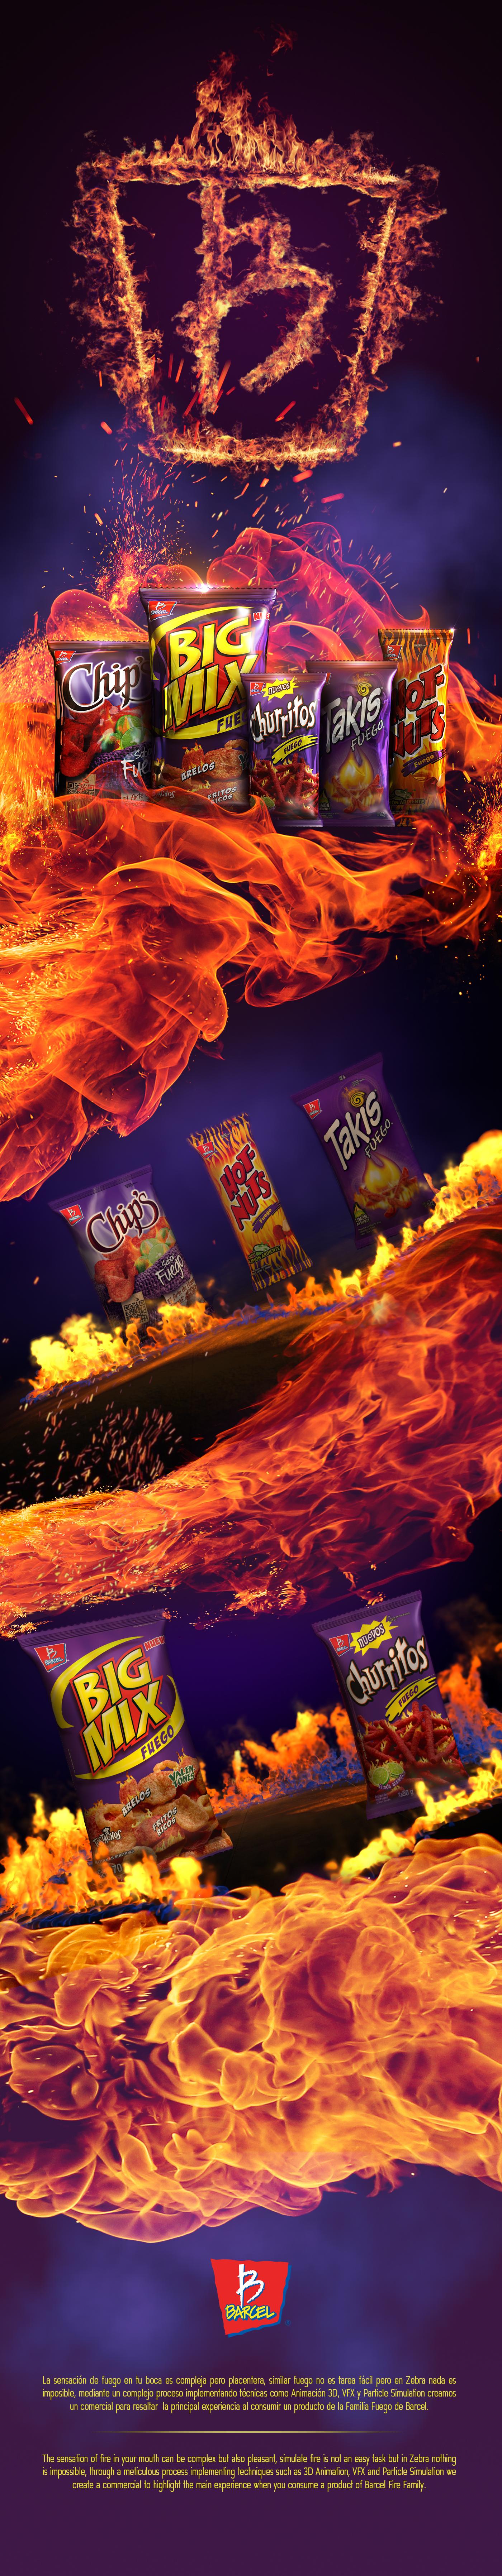 3D simulation snacks fire logo barcel